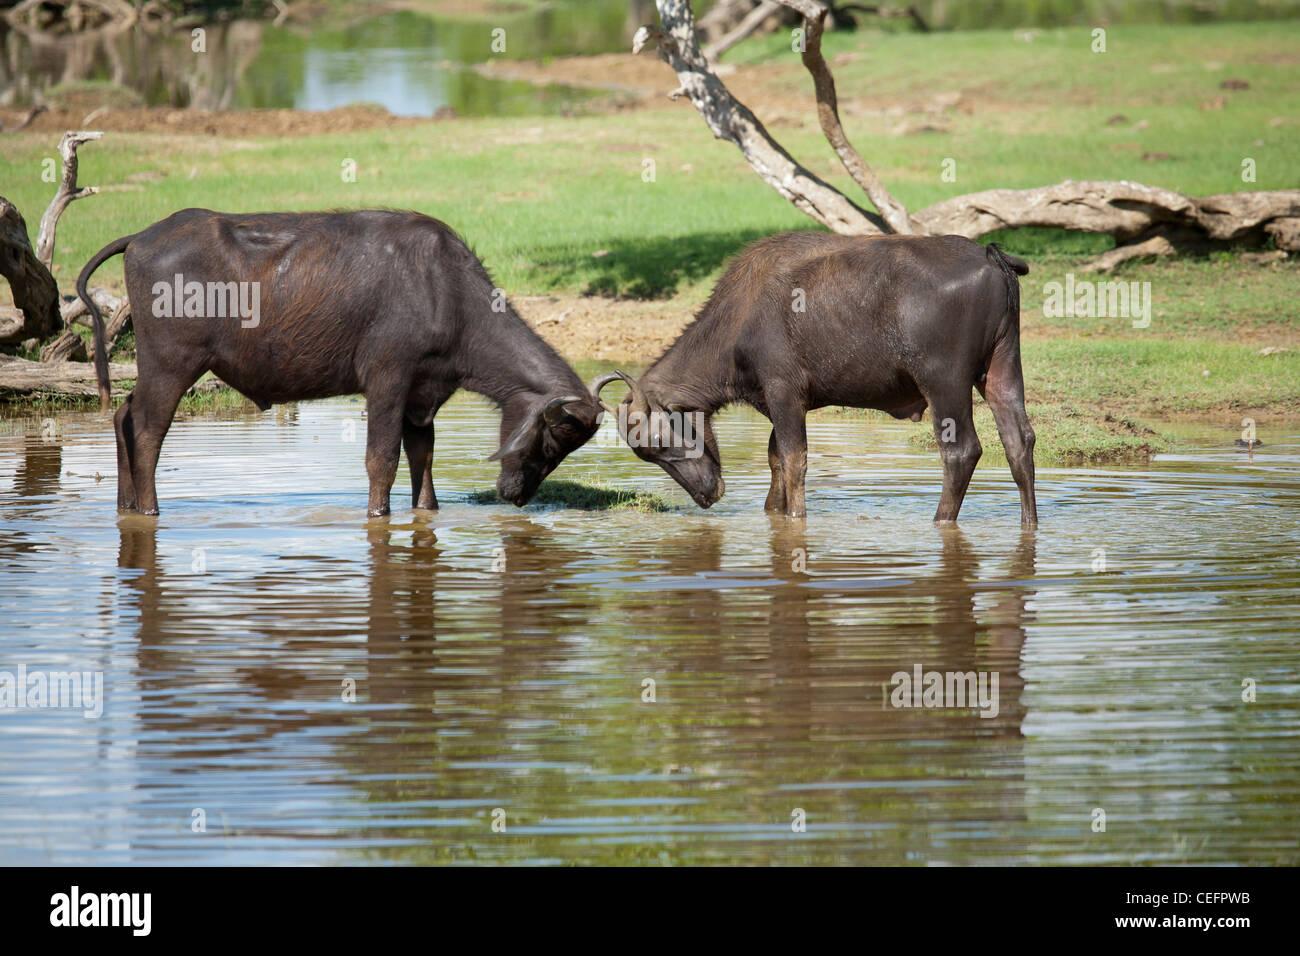 Two water buffalos interlocking horns - Stock Image